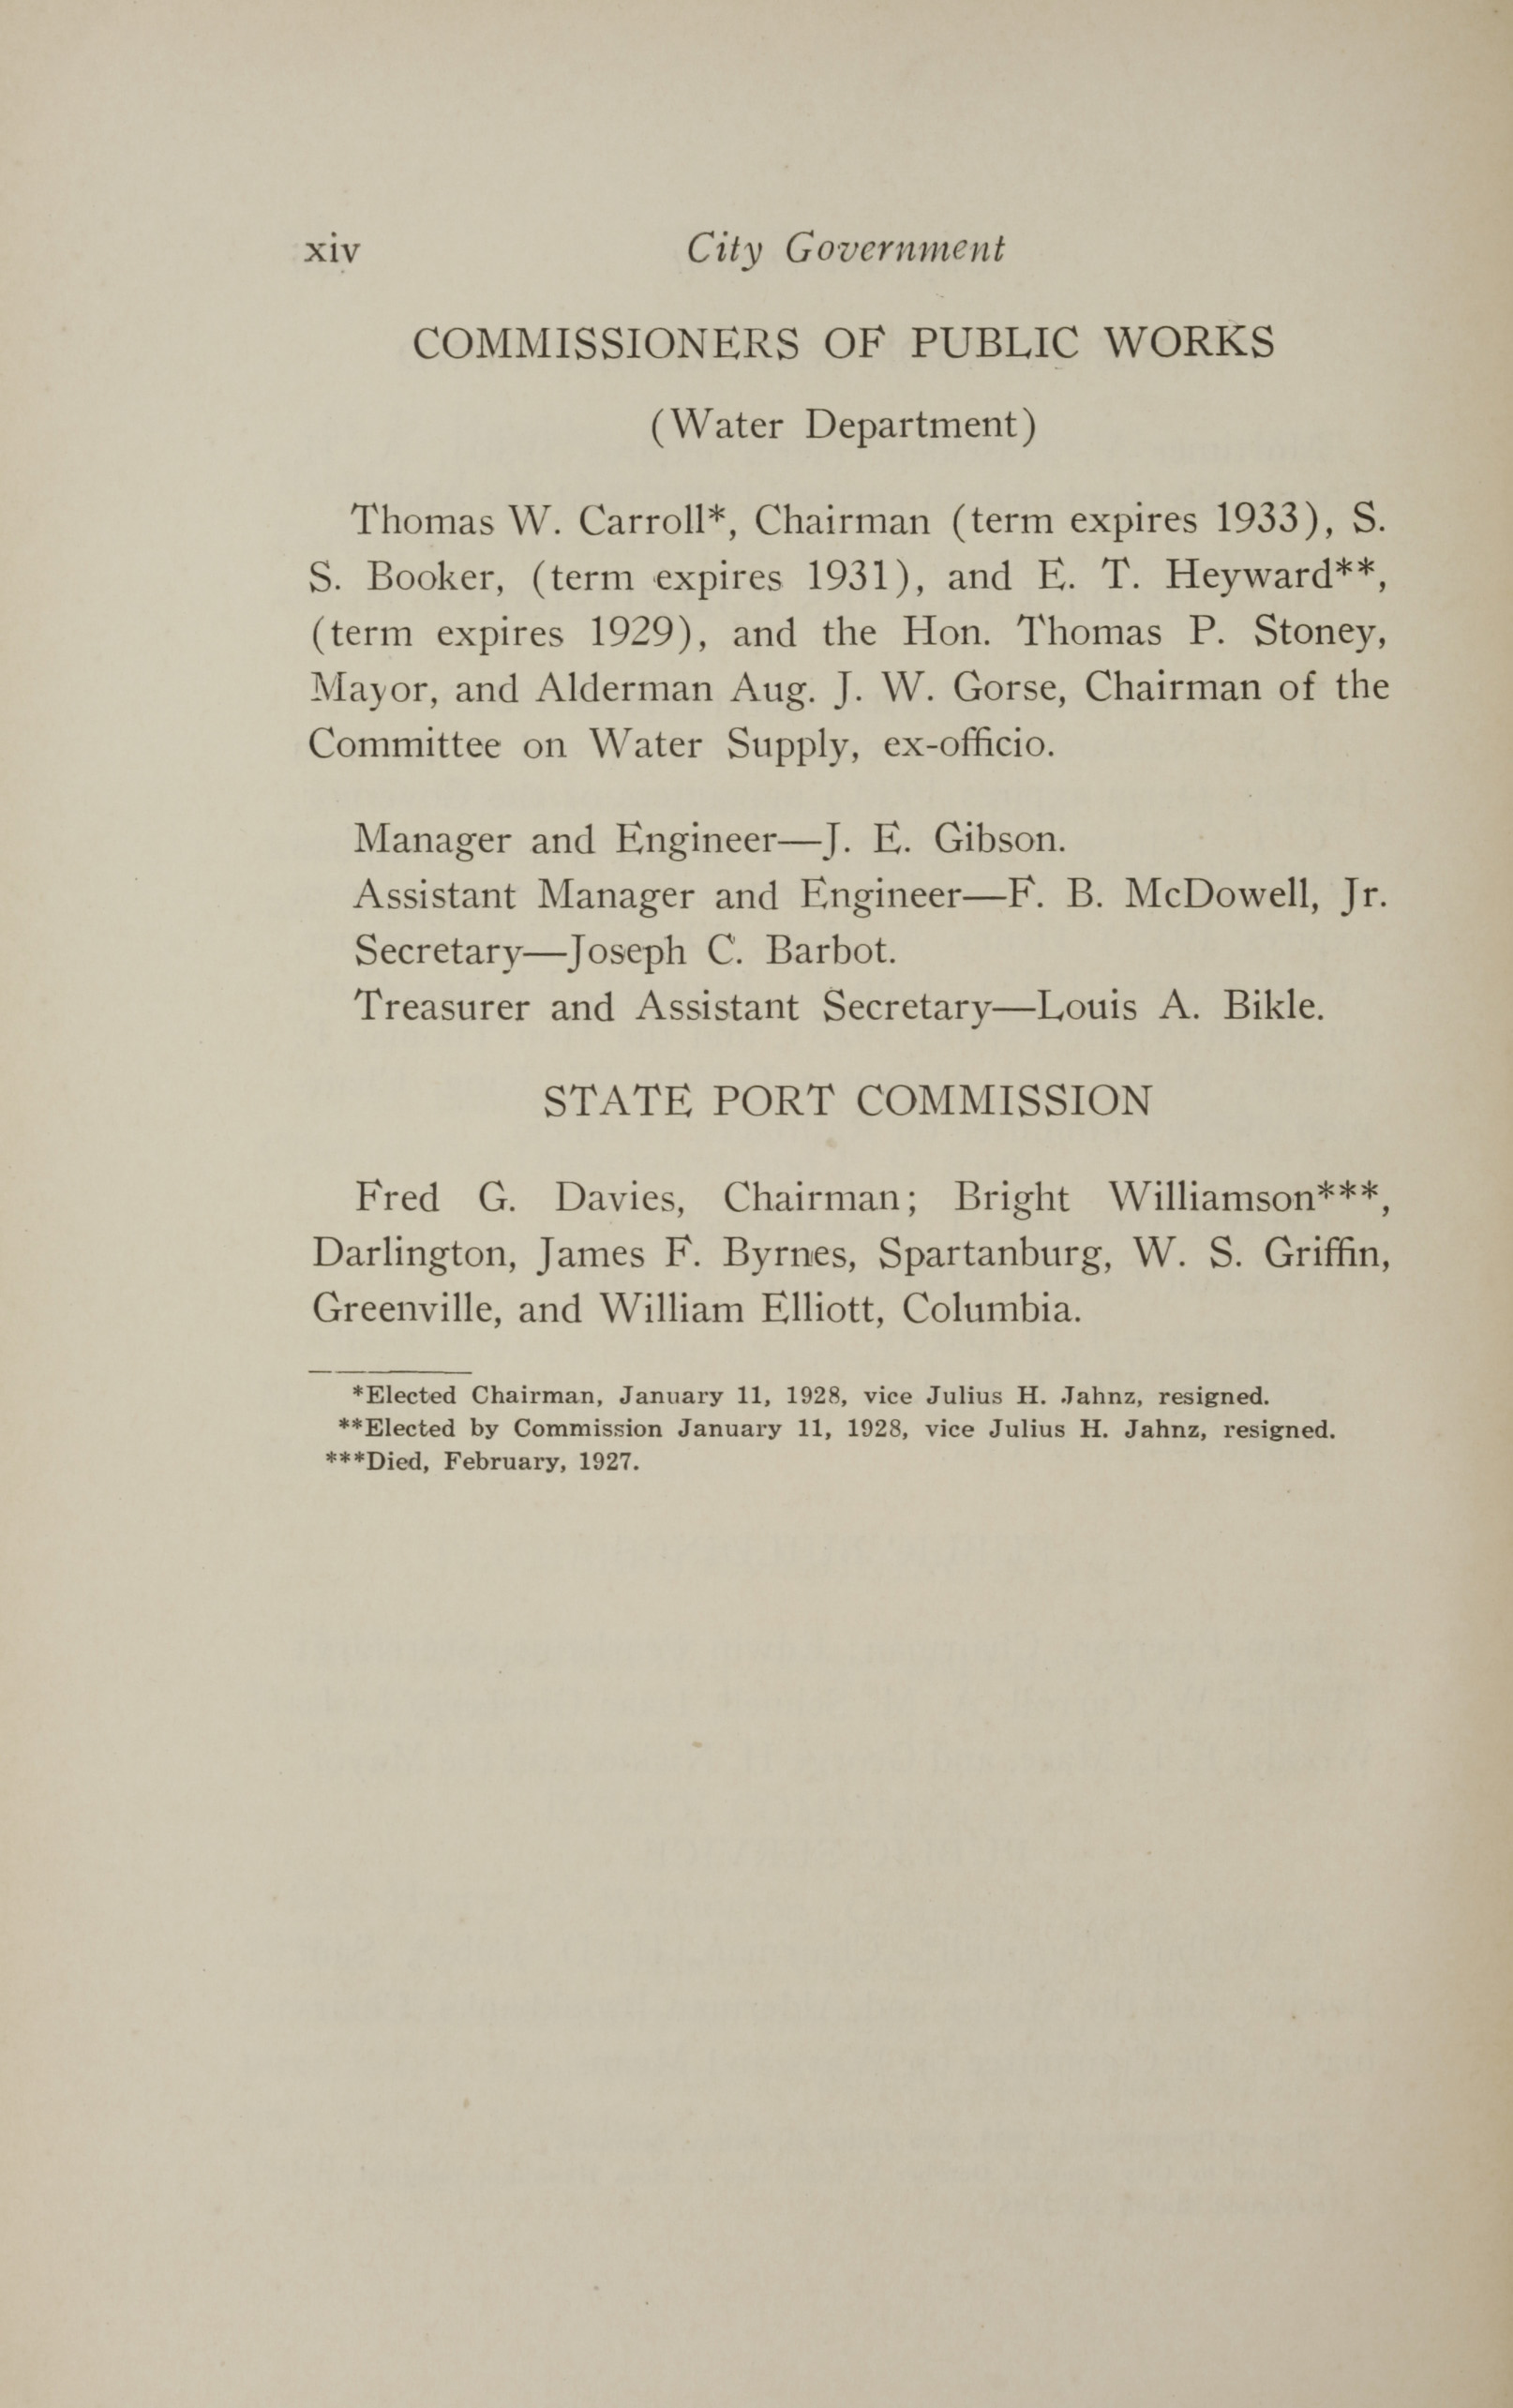 Charleston Yearbook, 1928, page xiv